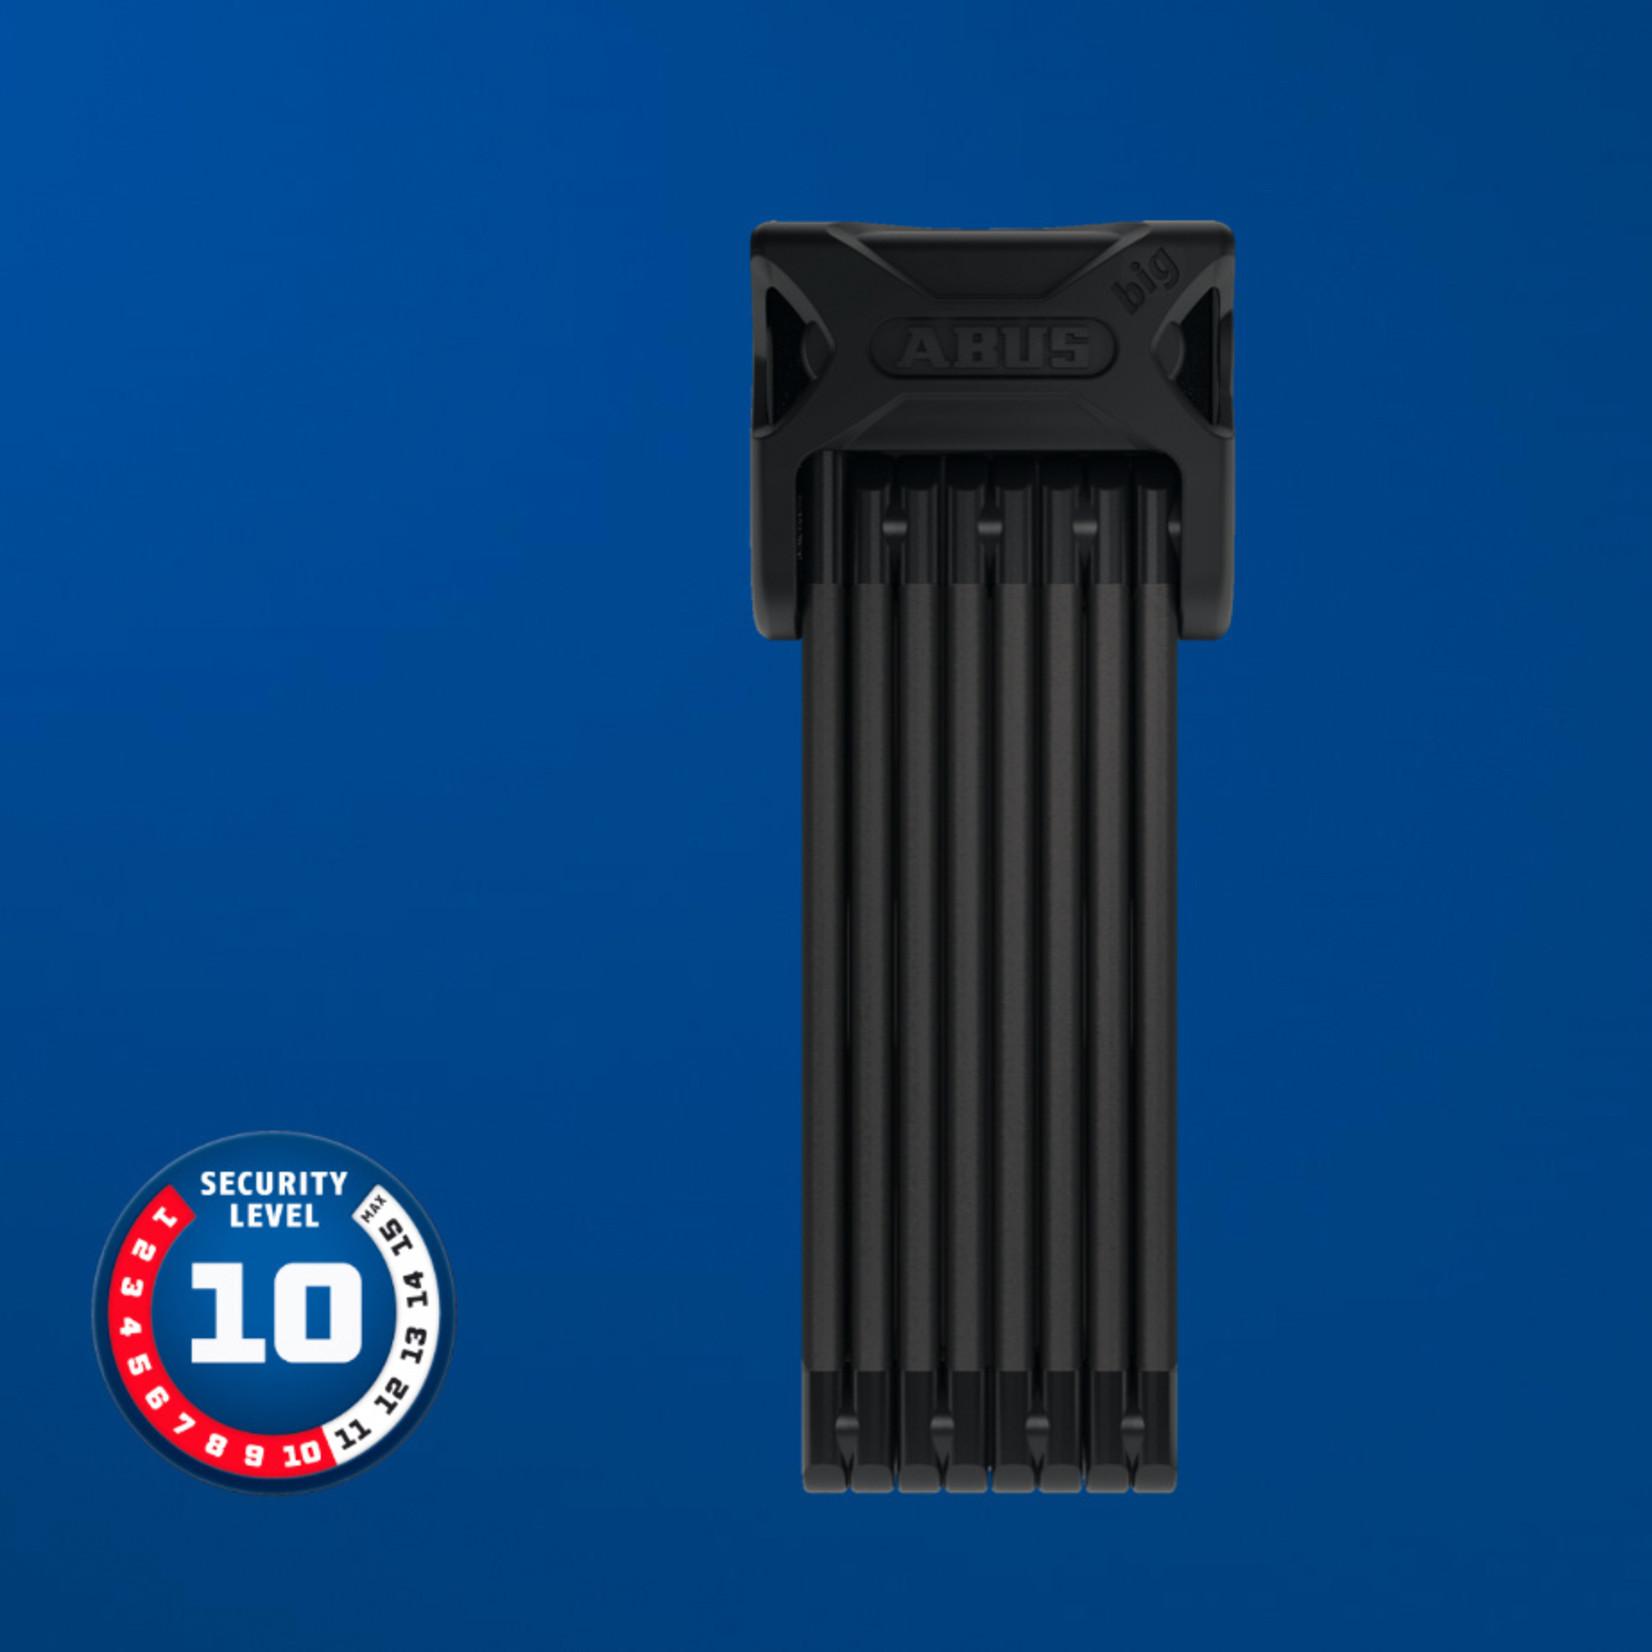 Abus Bordo Big 6000 Folding Lock w/ Key, 120 cm, Black